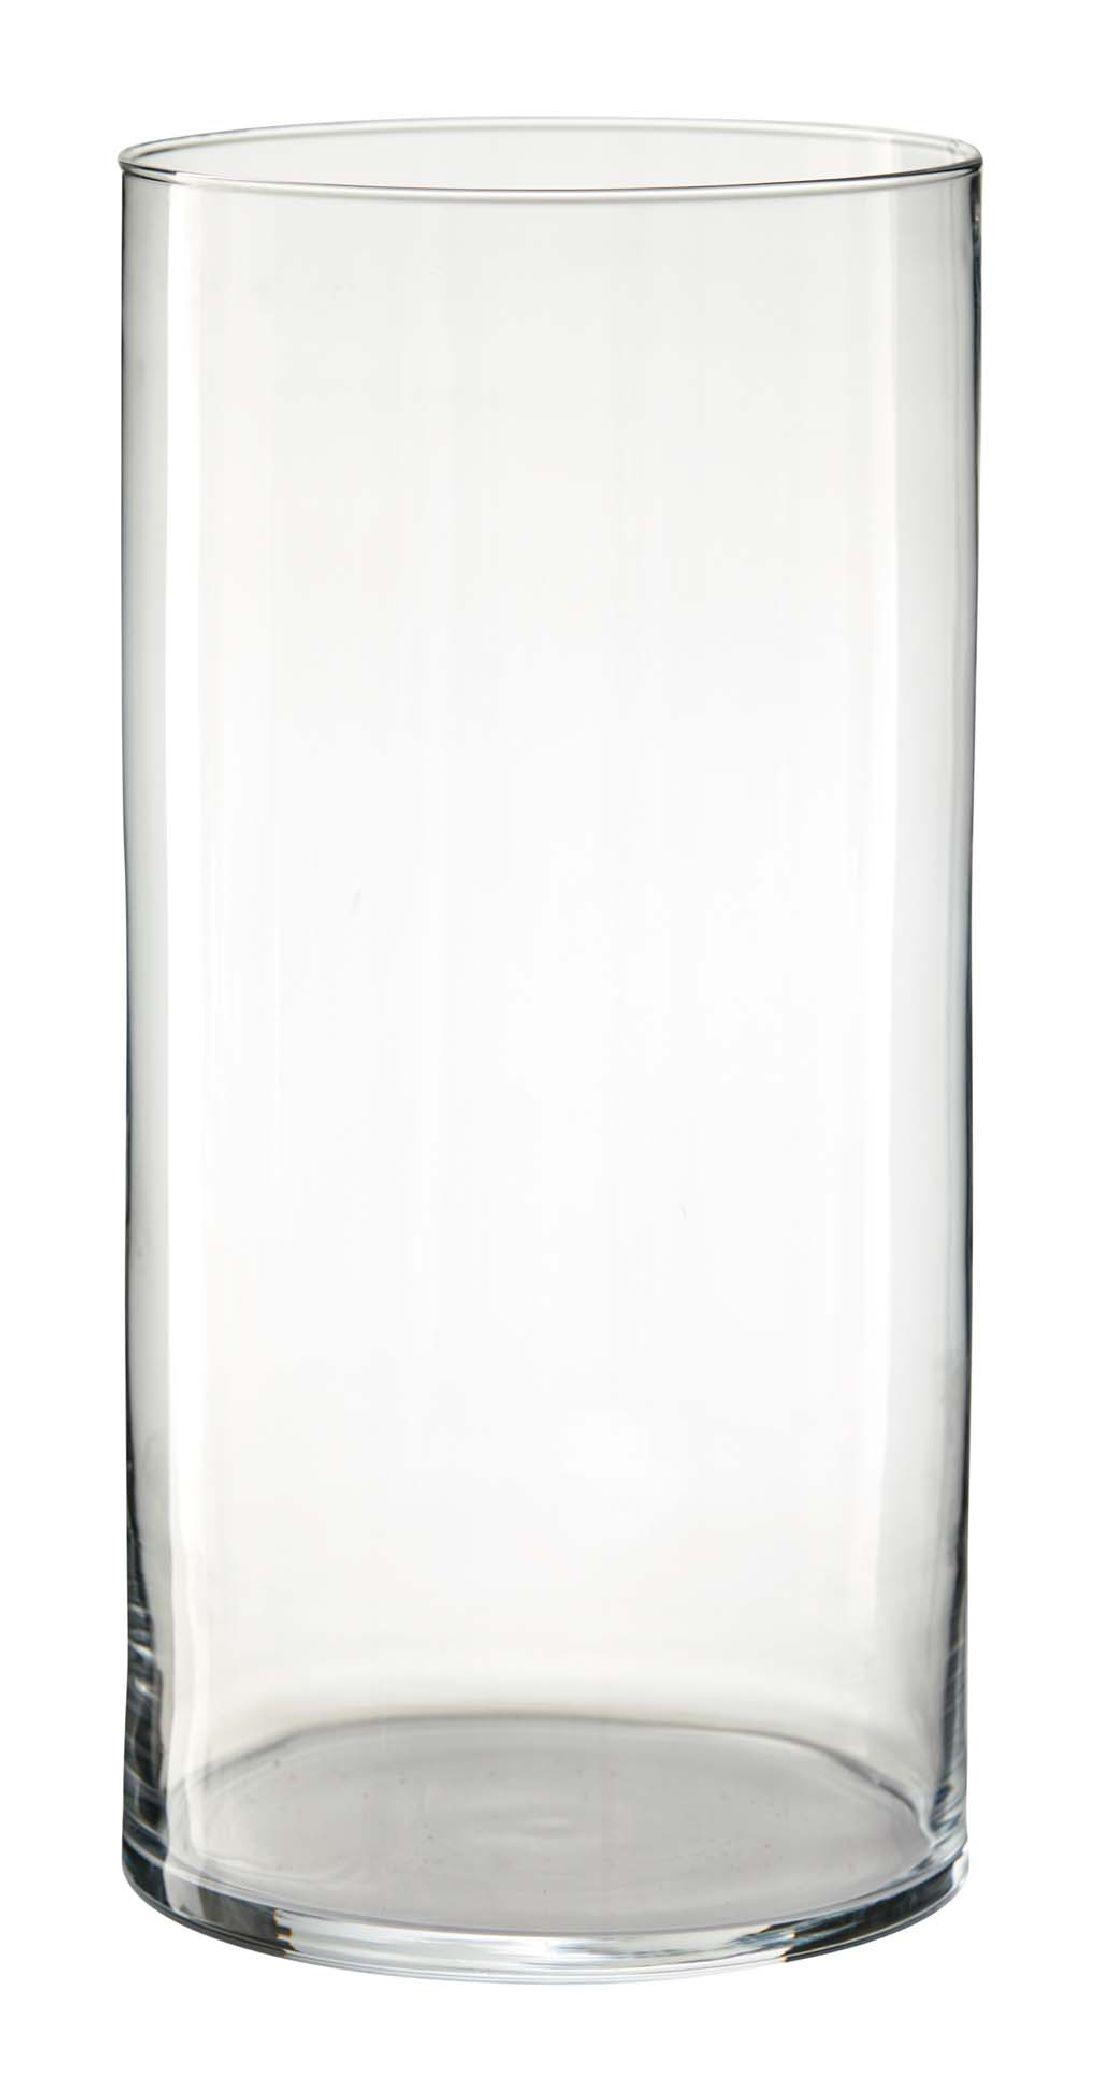 Zylinder Glas KLAR 1853/40 Ø19xh40cm